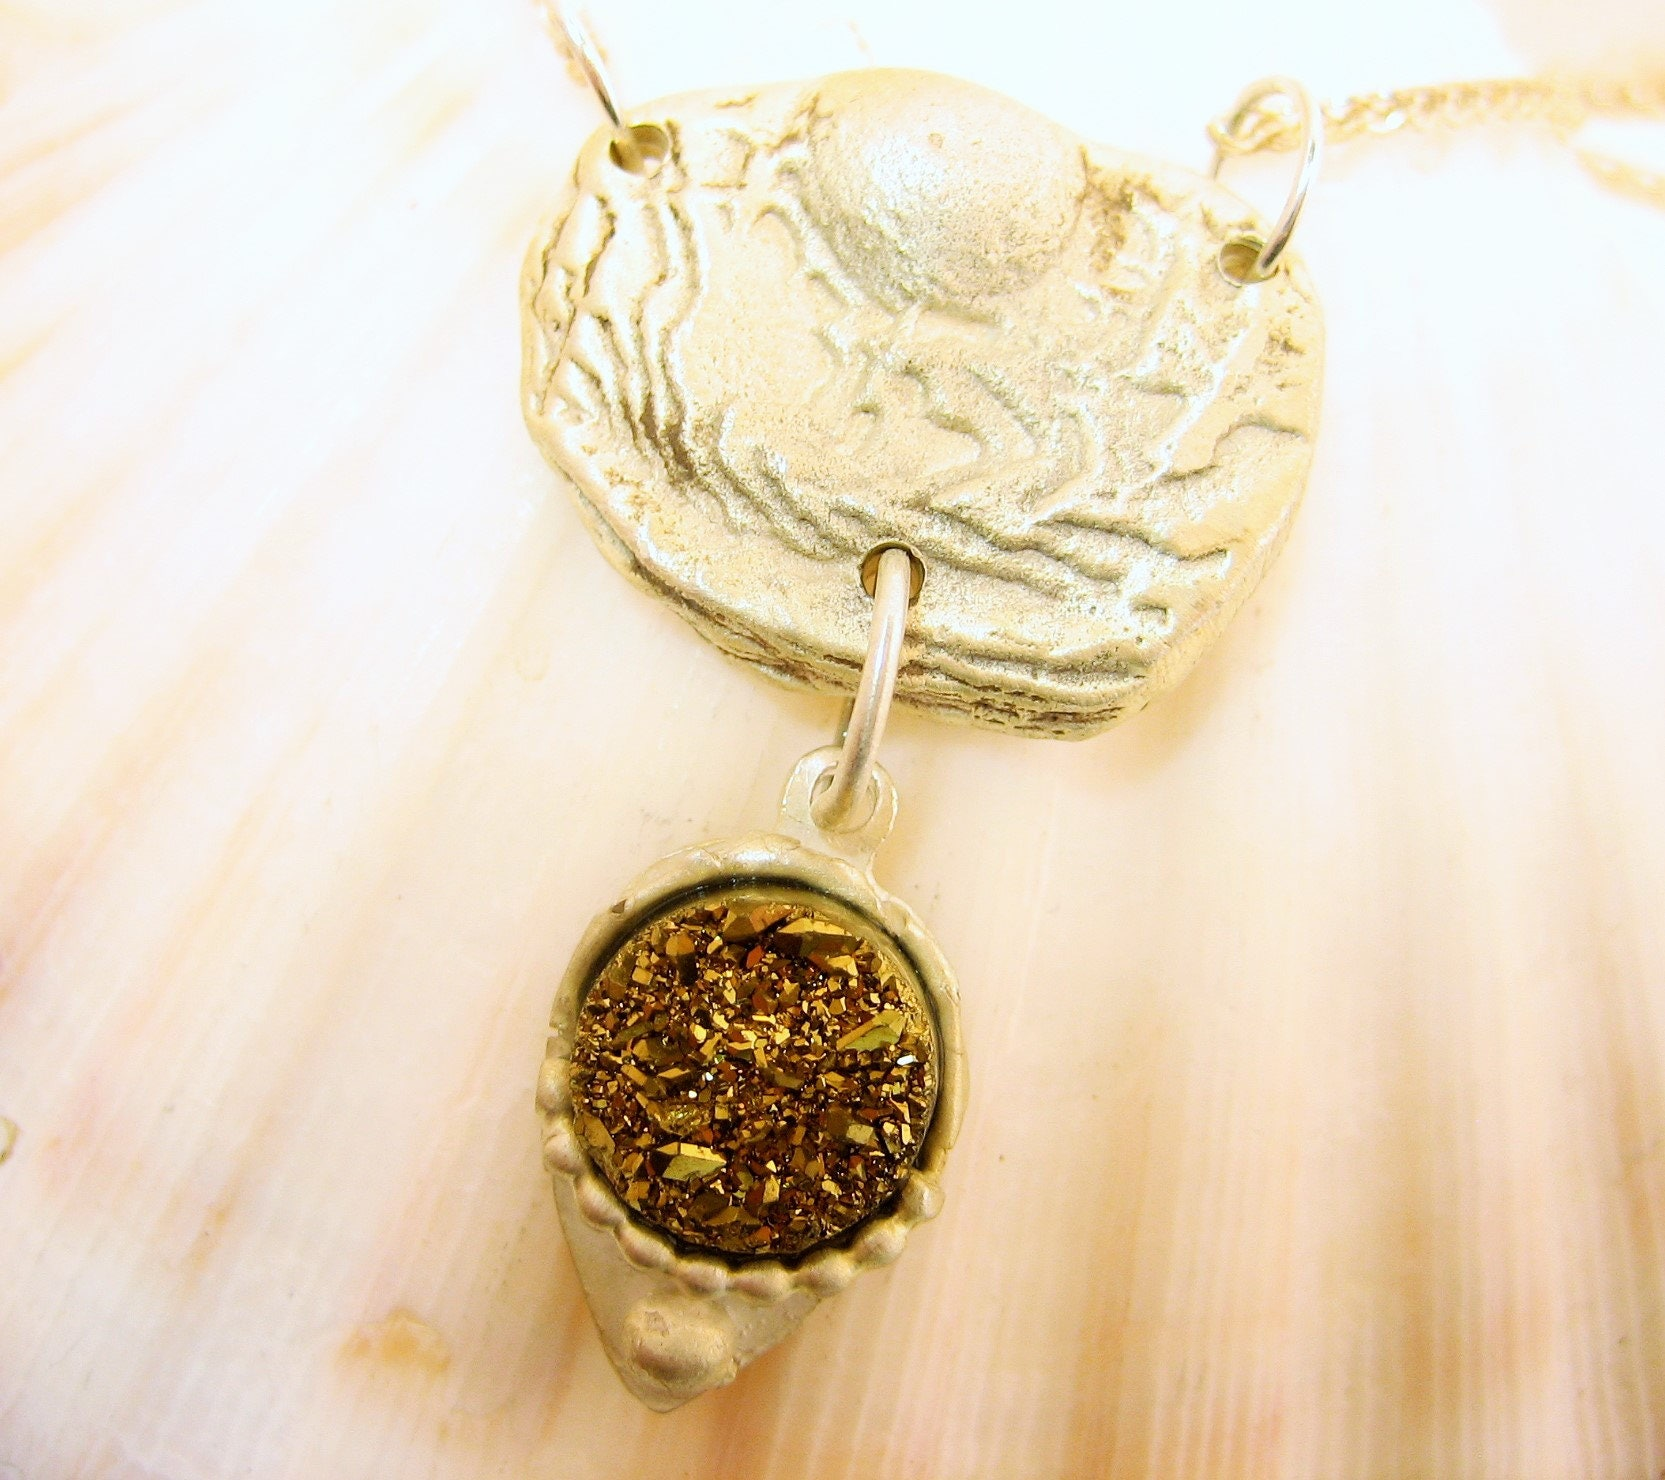 Golden druzy quartz pendant, unique sea coin silver pendant, silver and gold pendant, two toned necklace, silver and gold artisan necklace